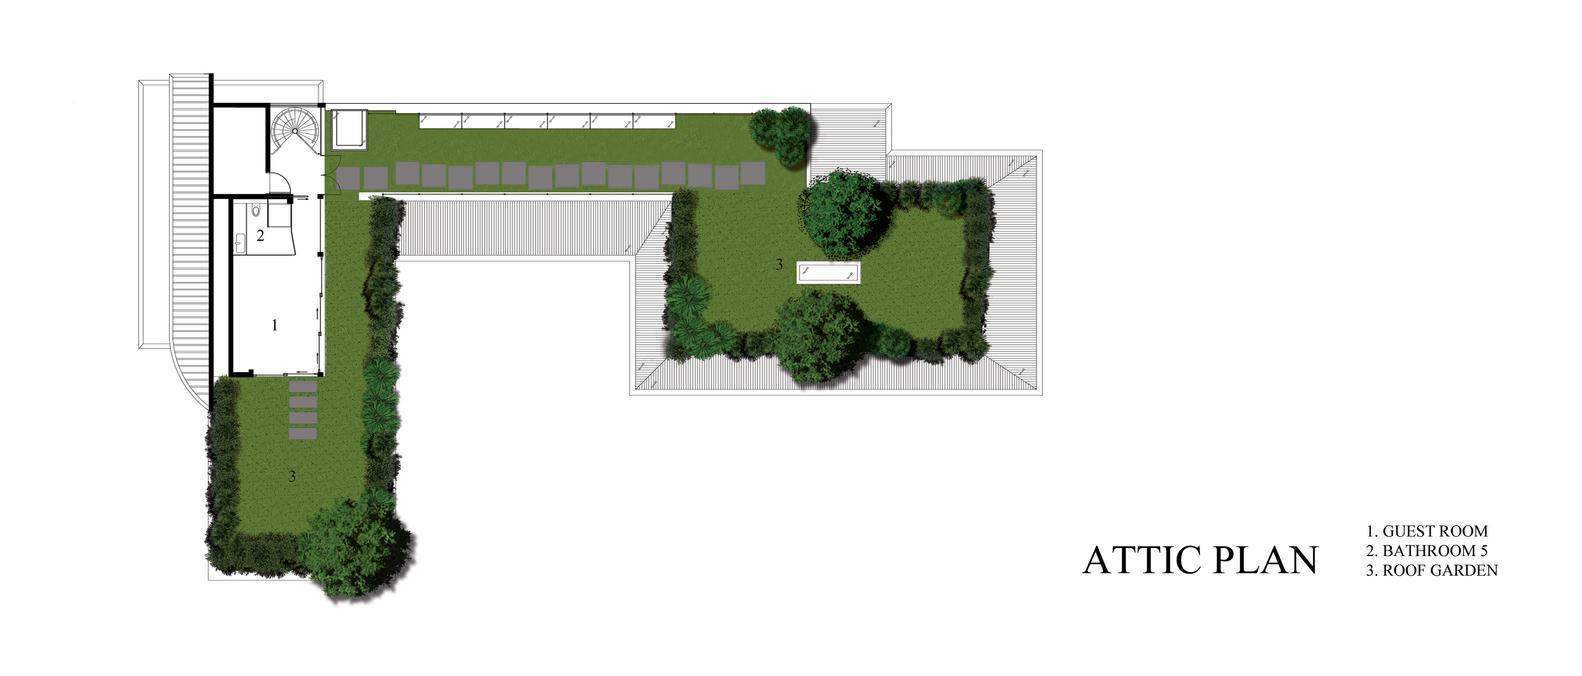 Dalvey_House_Attic_Plan.jpg